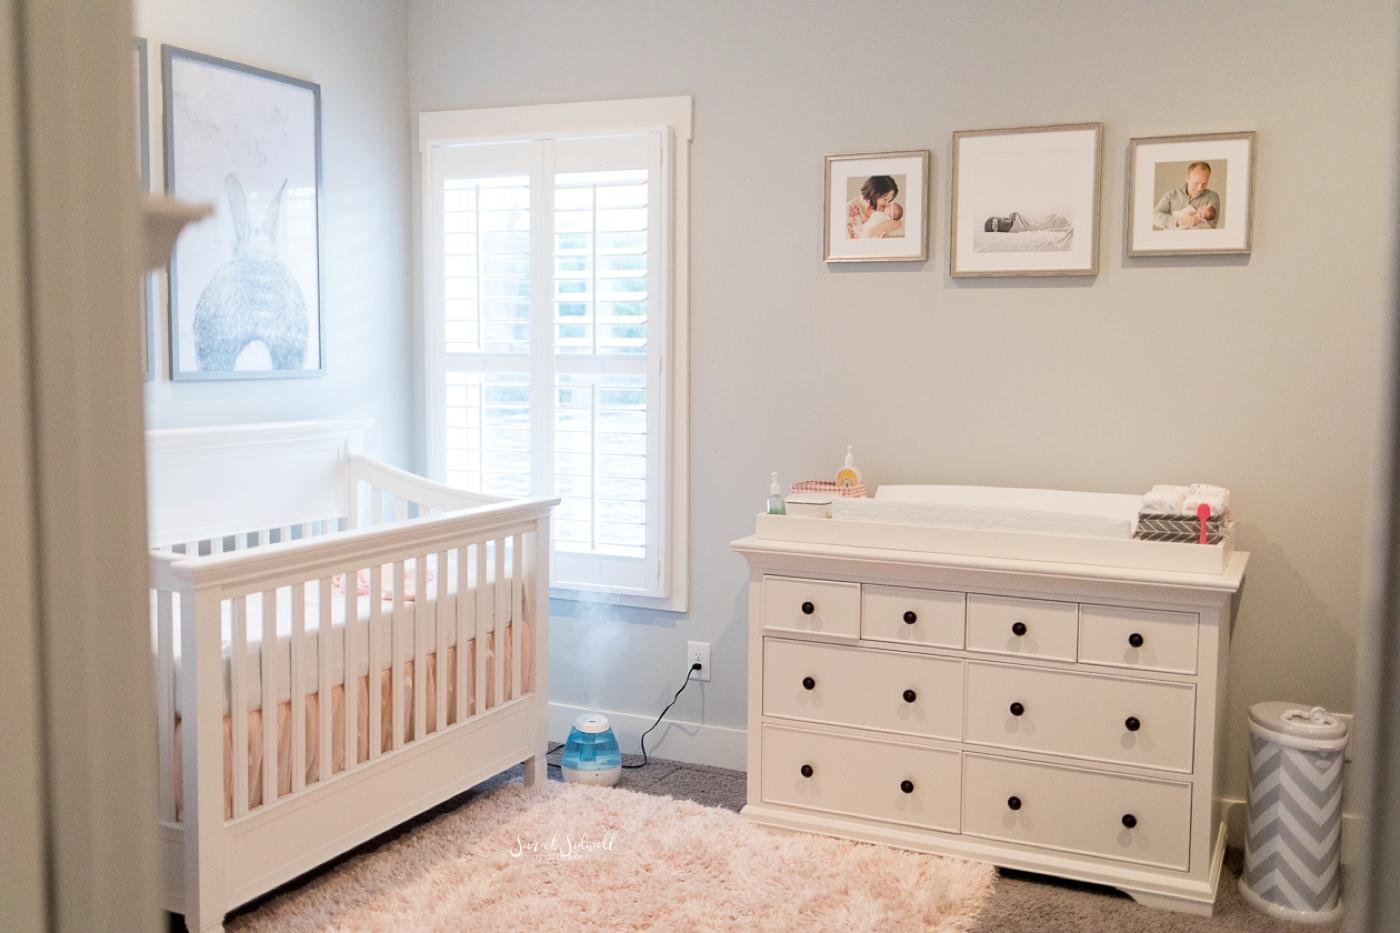 Newborn Gallery Wall | Sarah Sidwell Photography